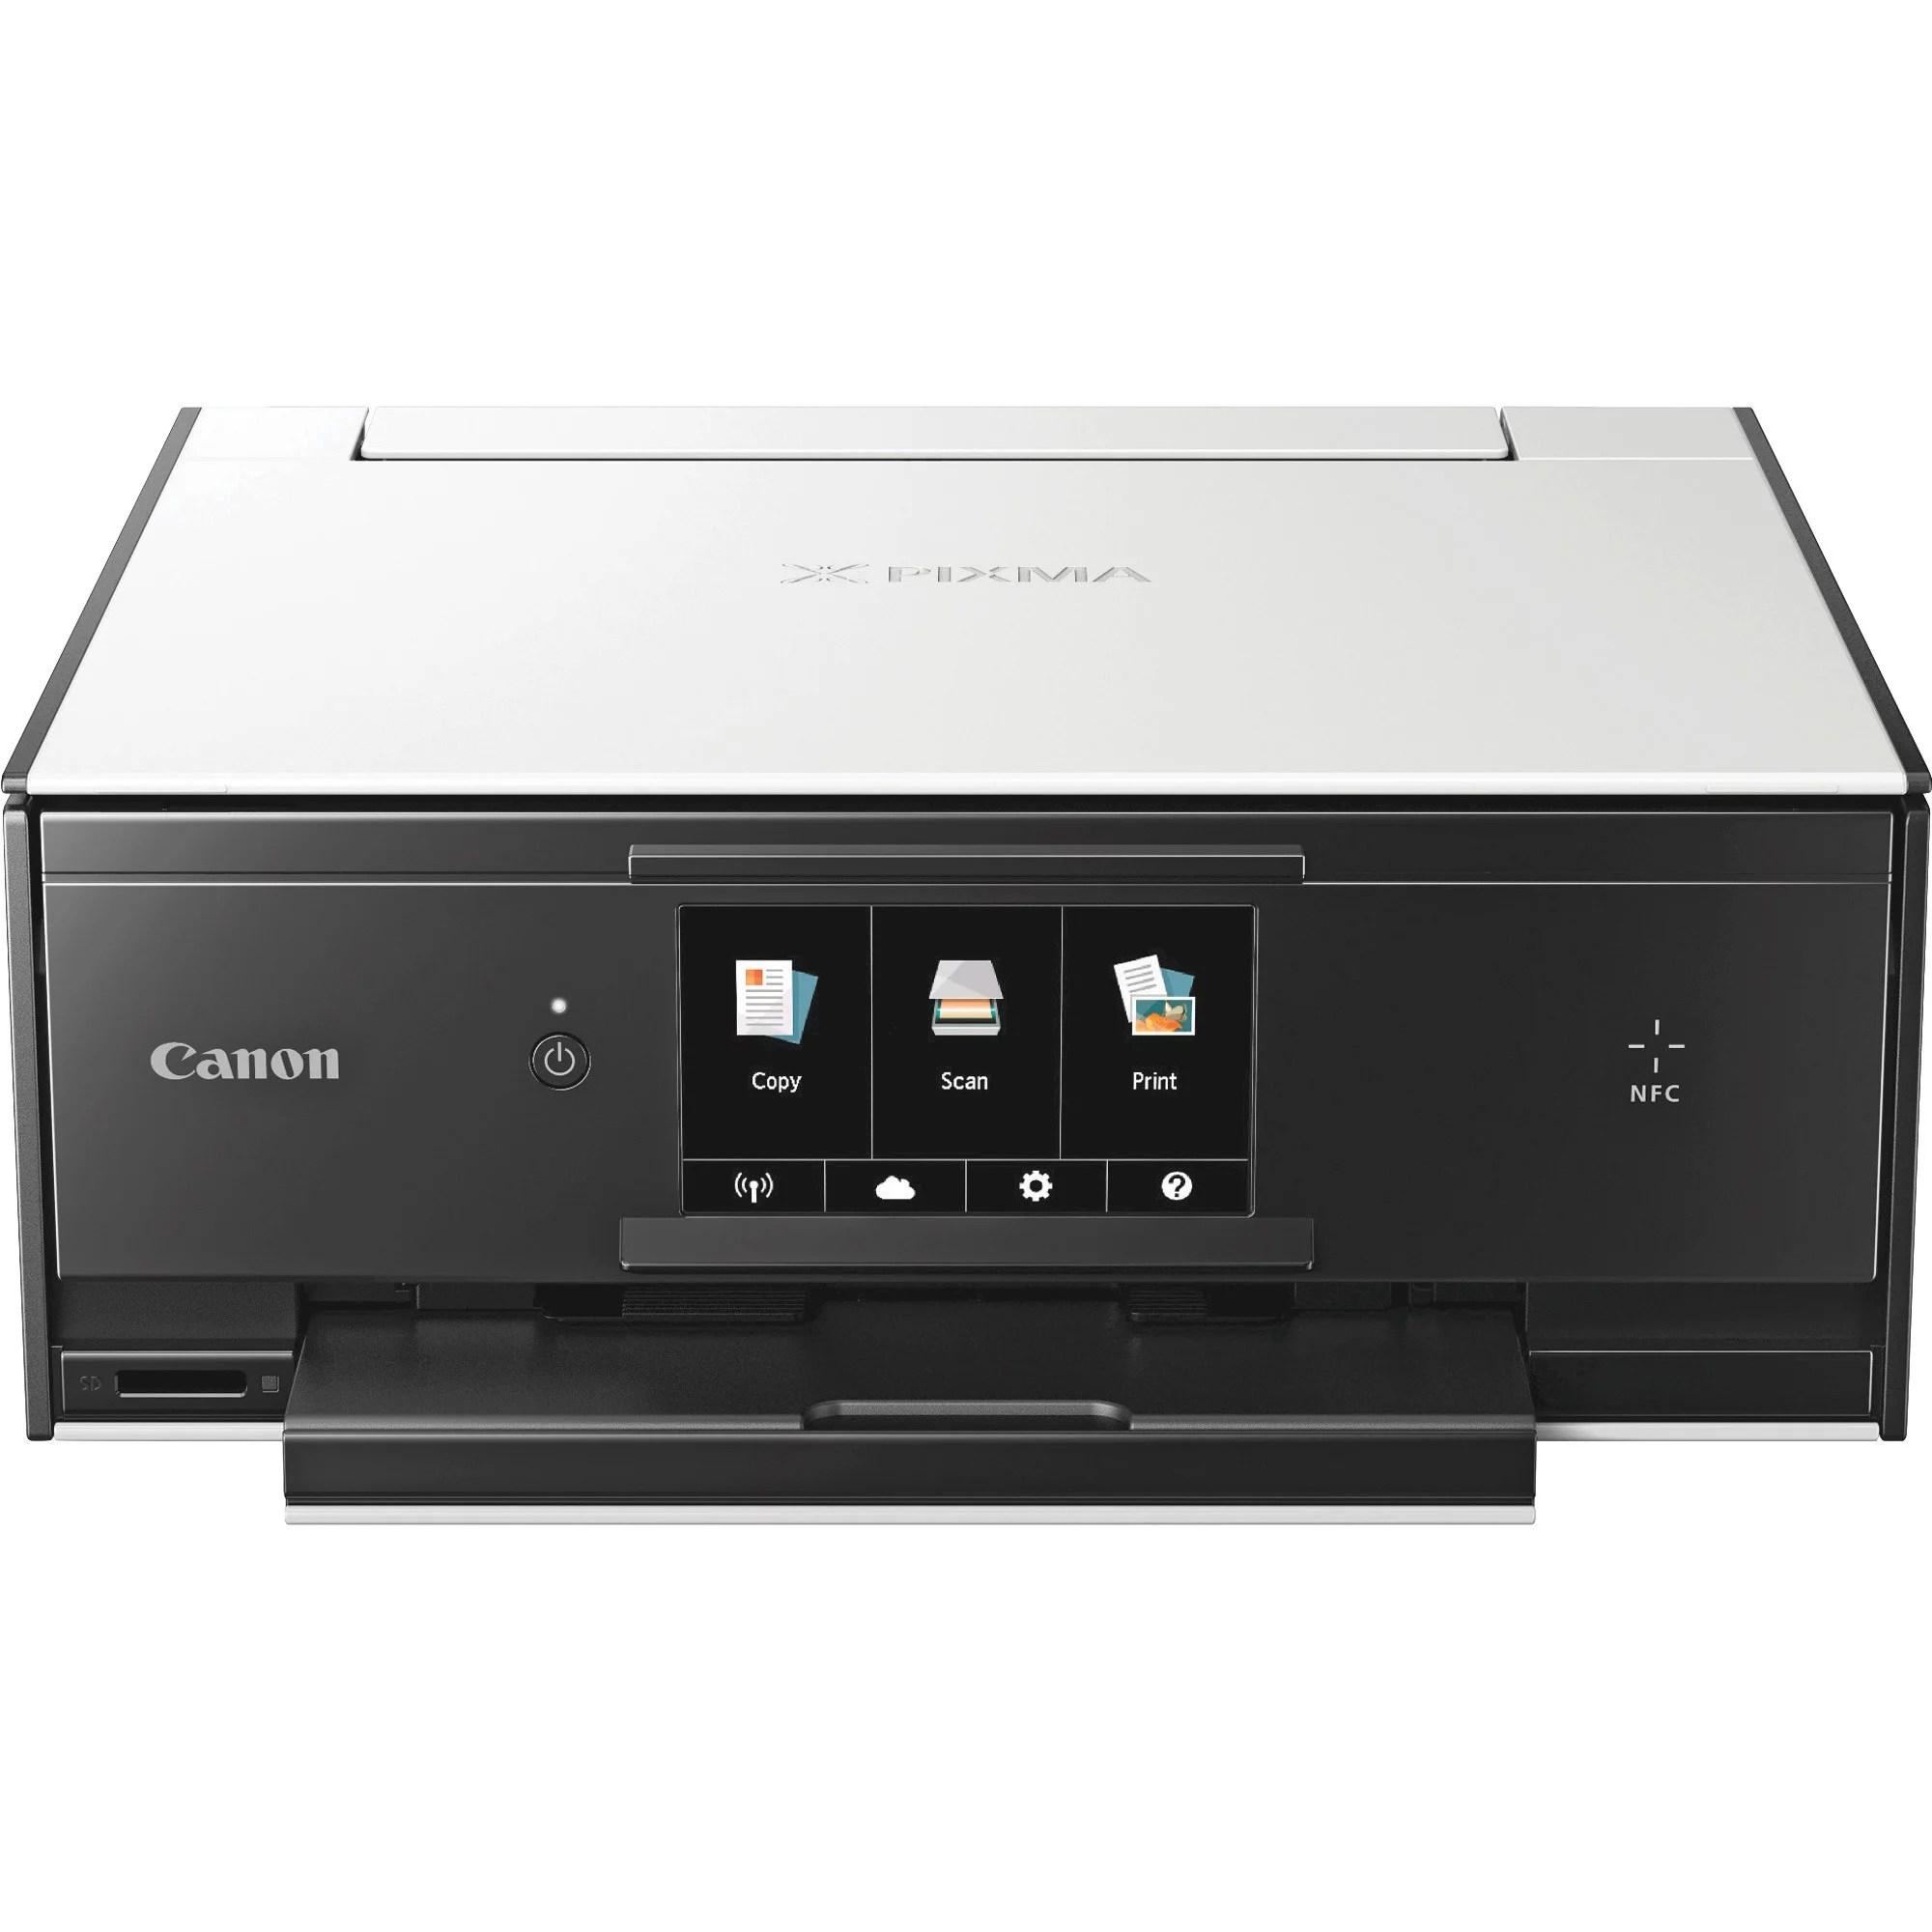 hight resolution of canon pixma ts9020 inkjet multifunction printer color photo print desktop walmart com